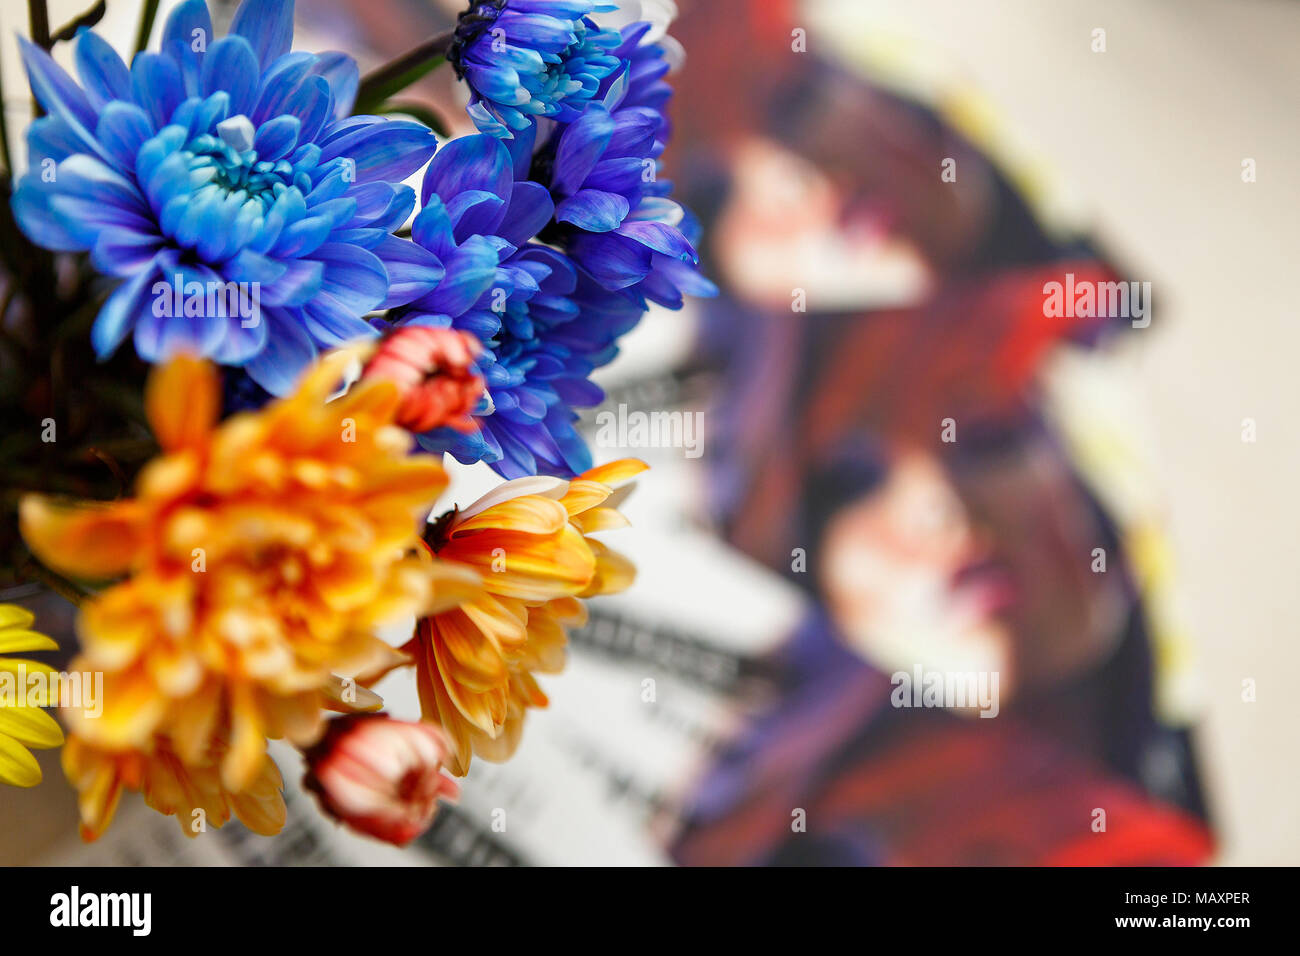 Bouquet ofblue and orange chrysanthemums - Stock Image